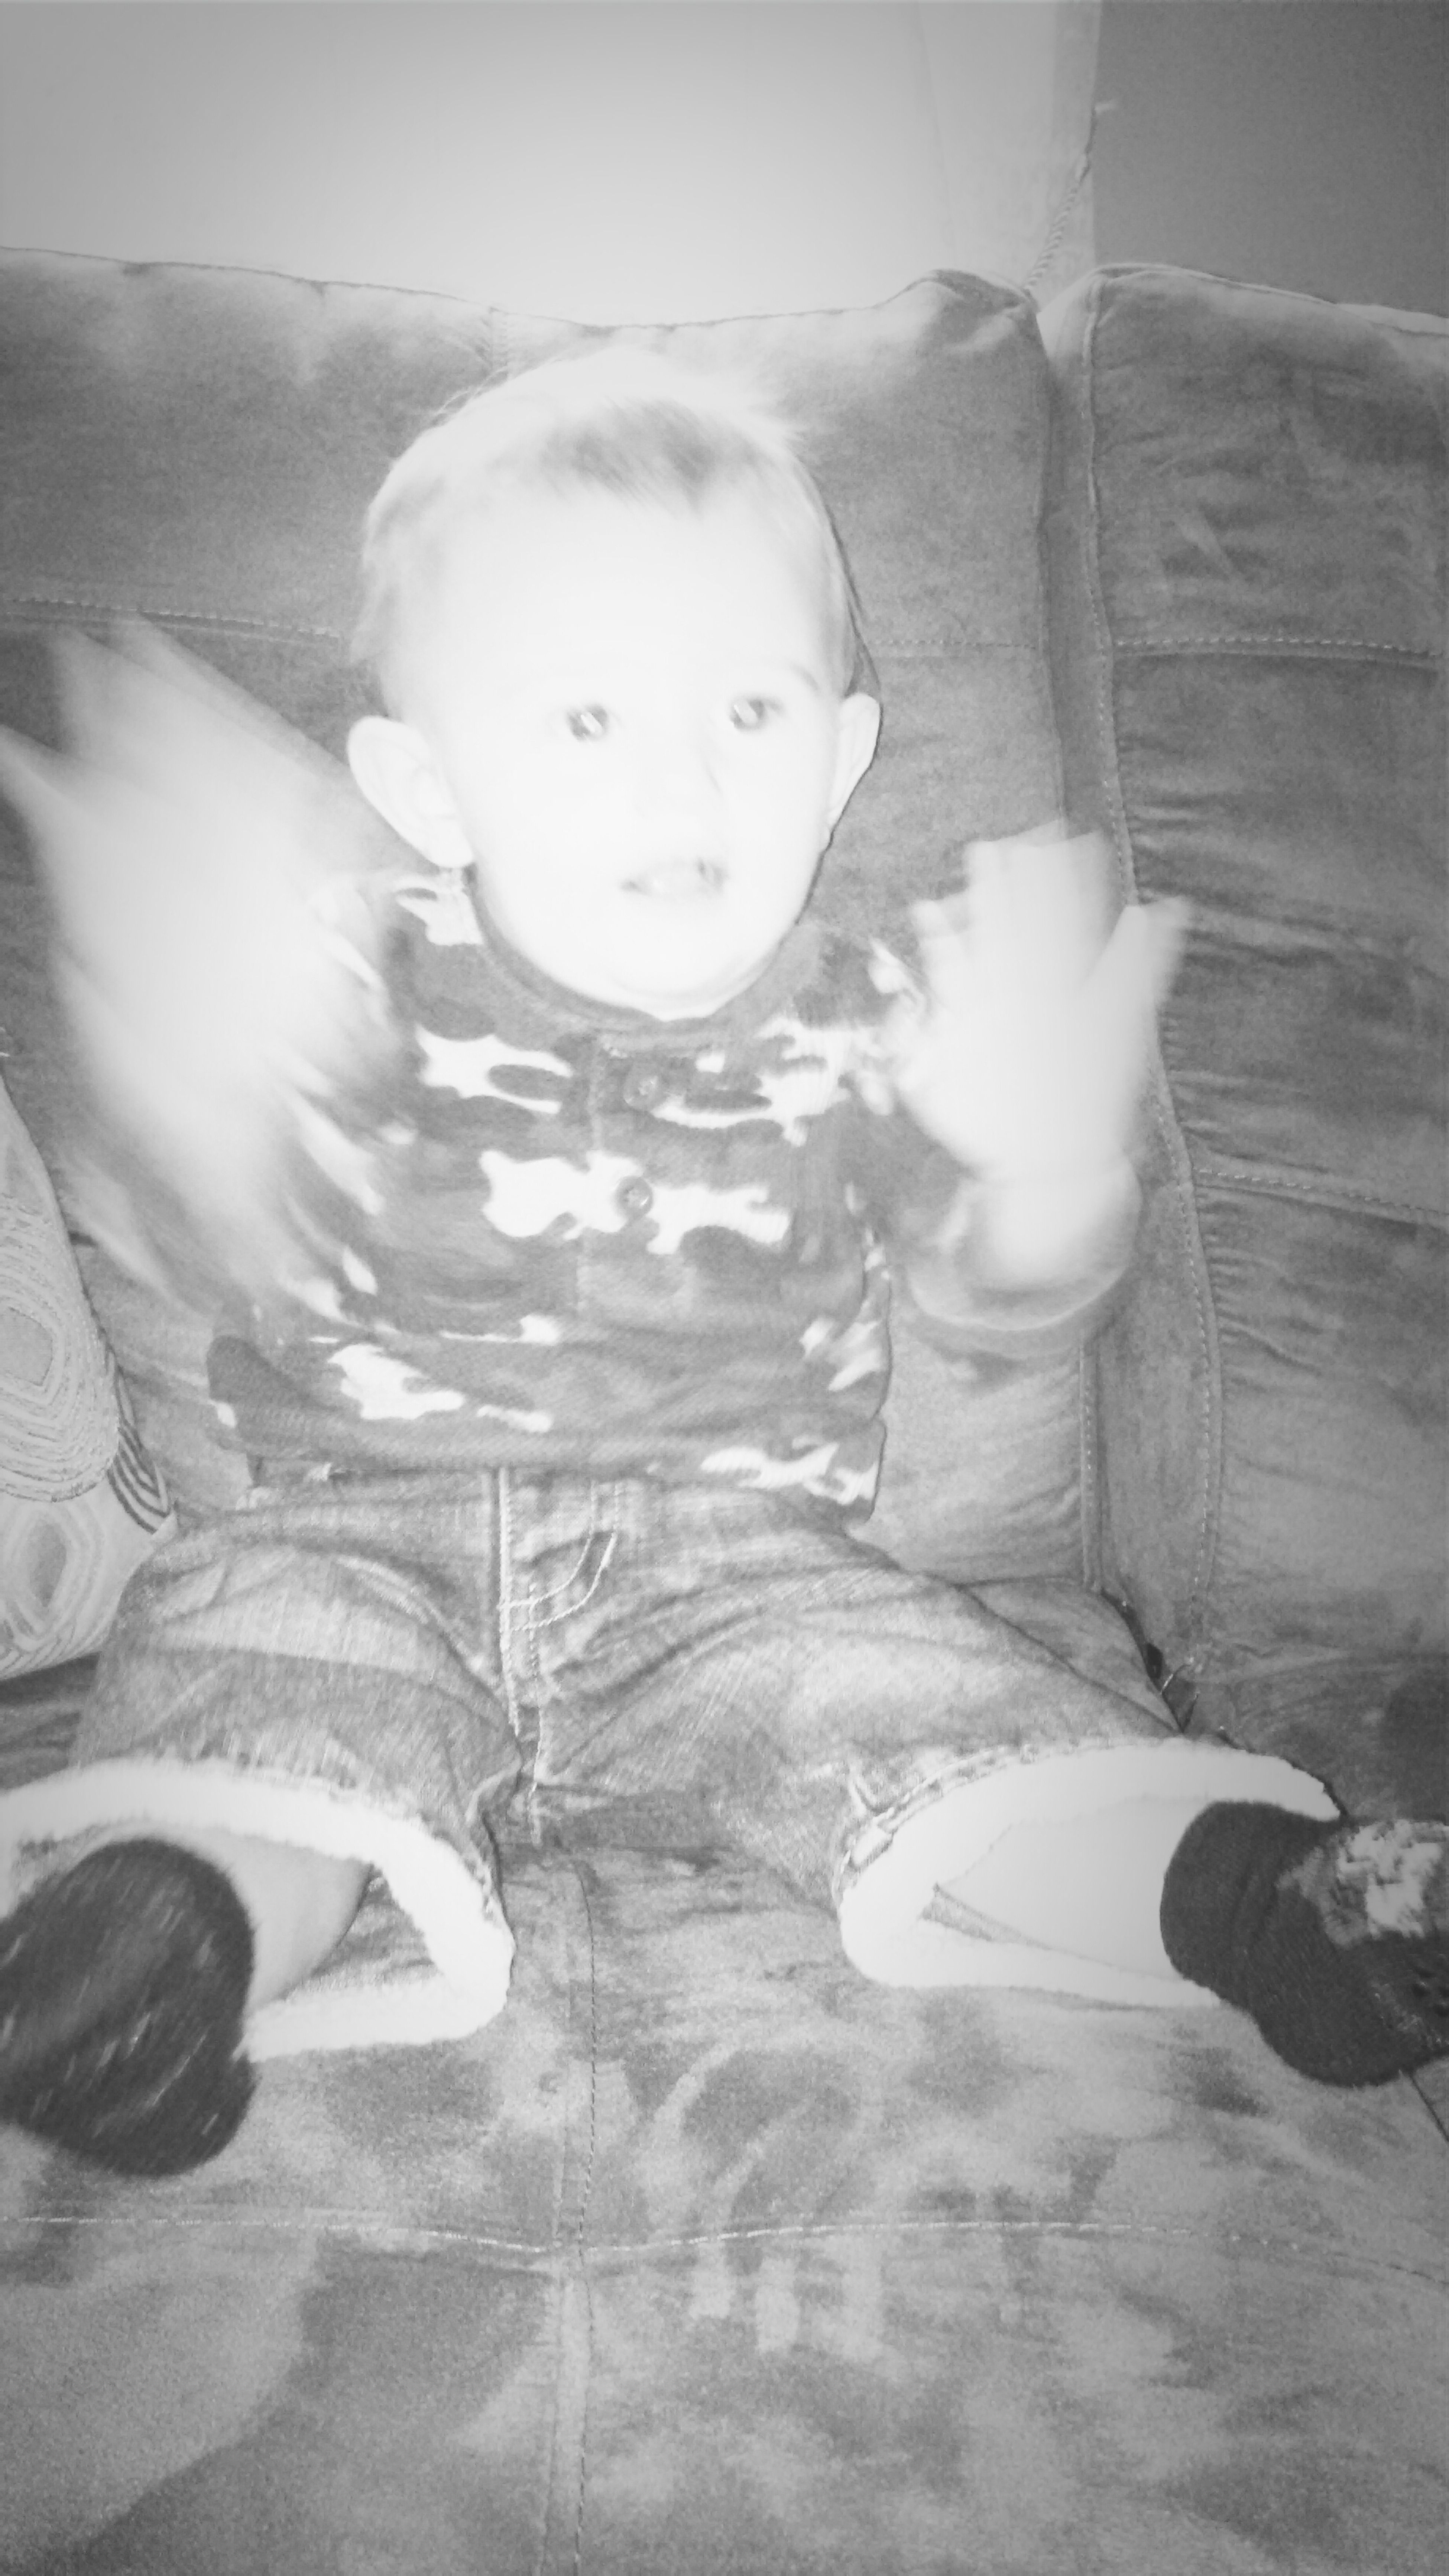 Thats my boy